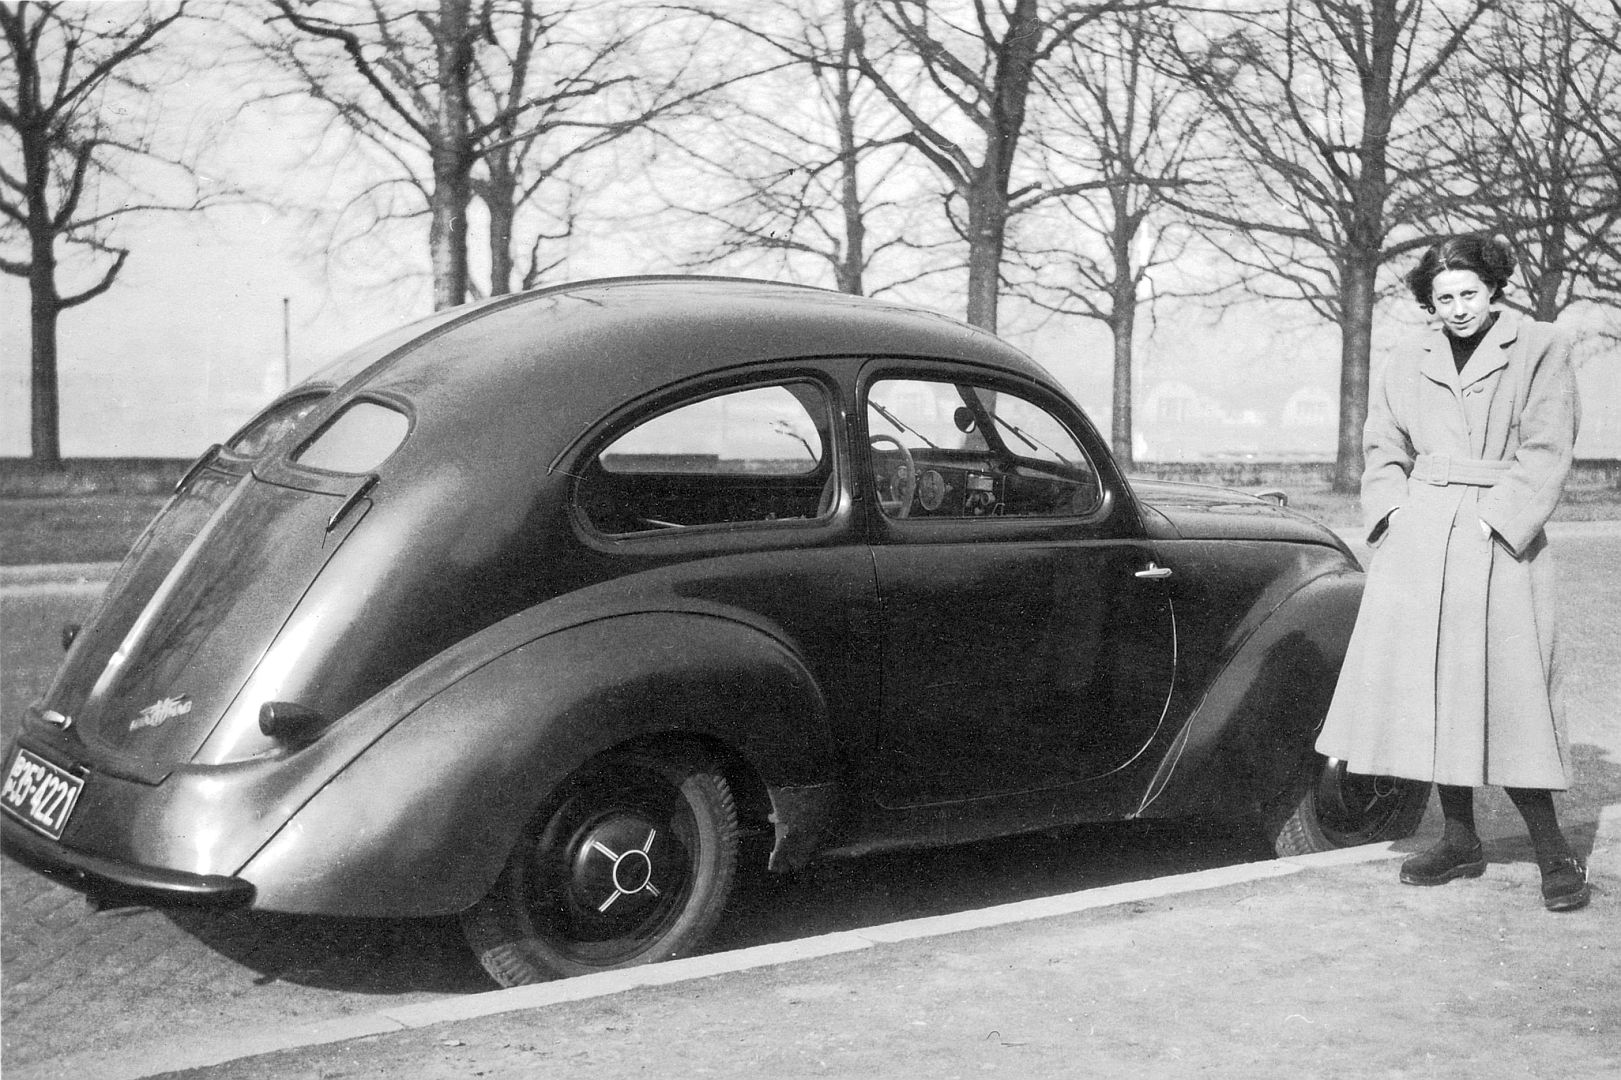 Hanomag_1.3_Liter_1950_Galerie